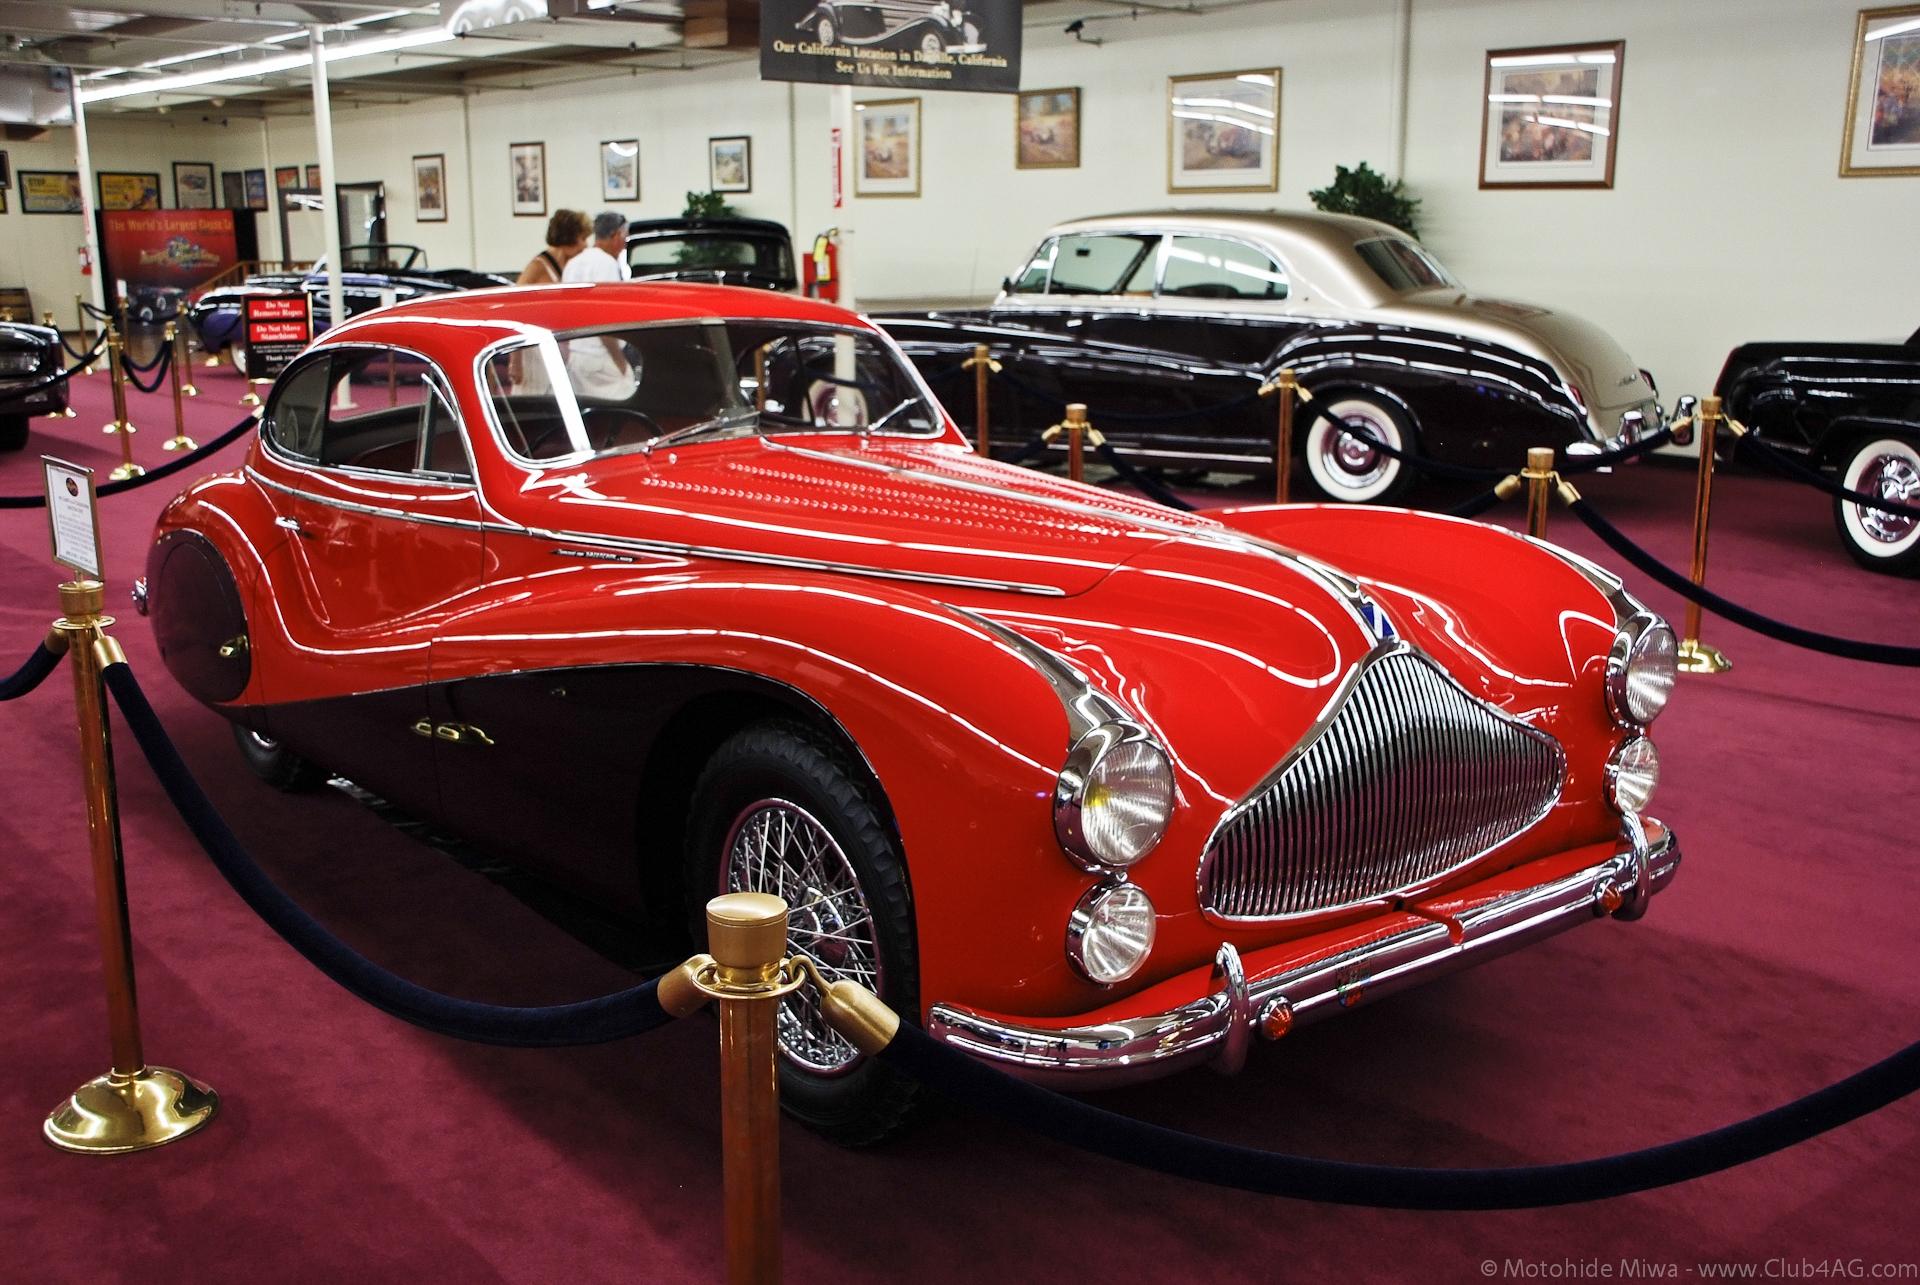 Las Vegas Cars For Sale By Owner Craigslist